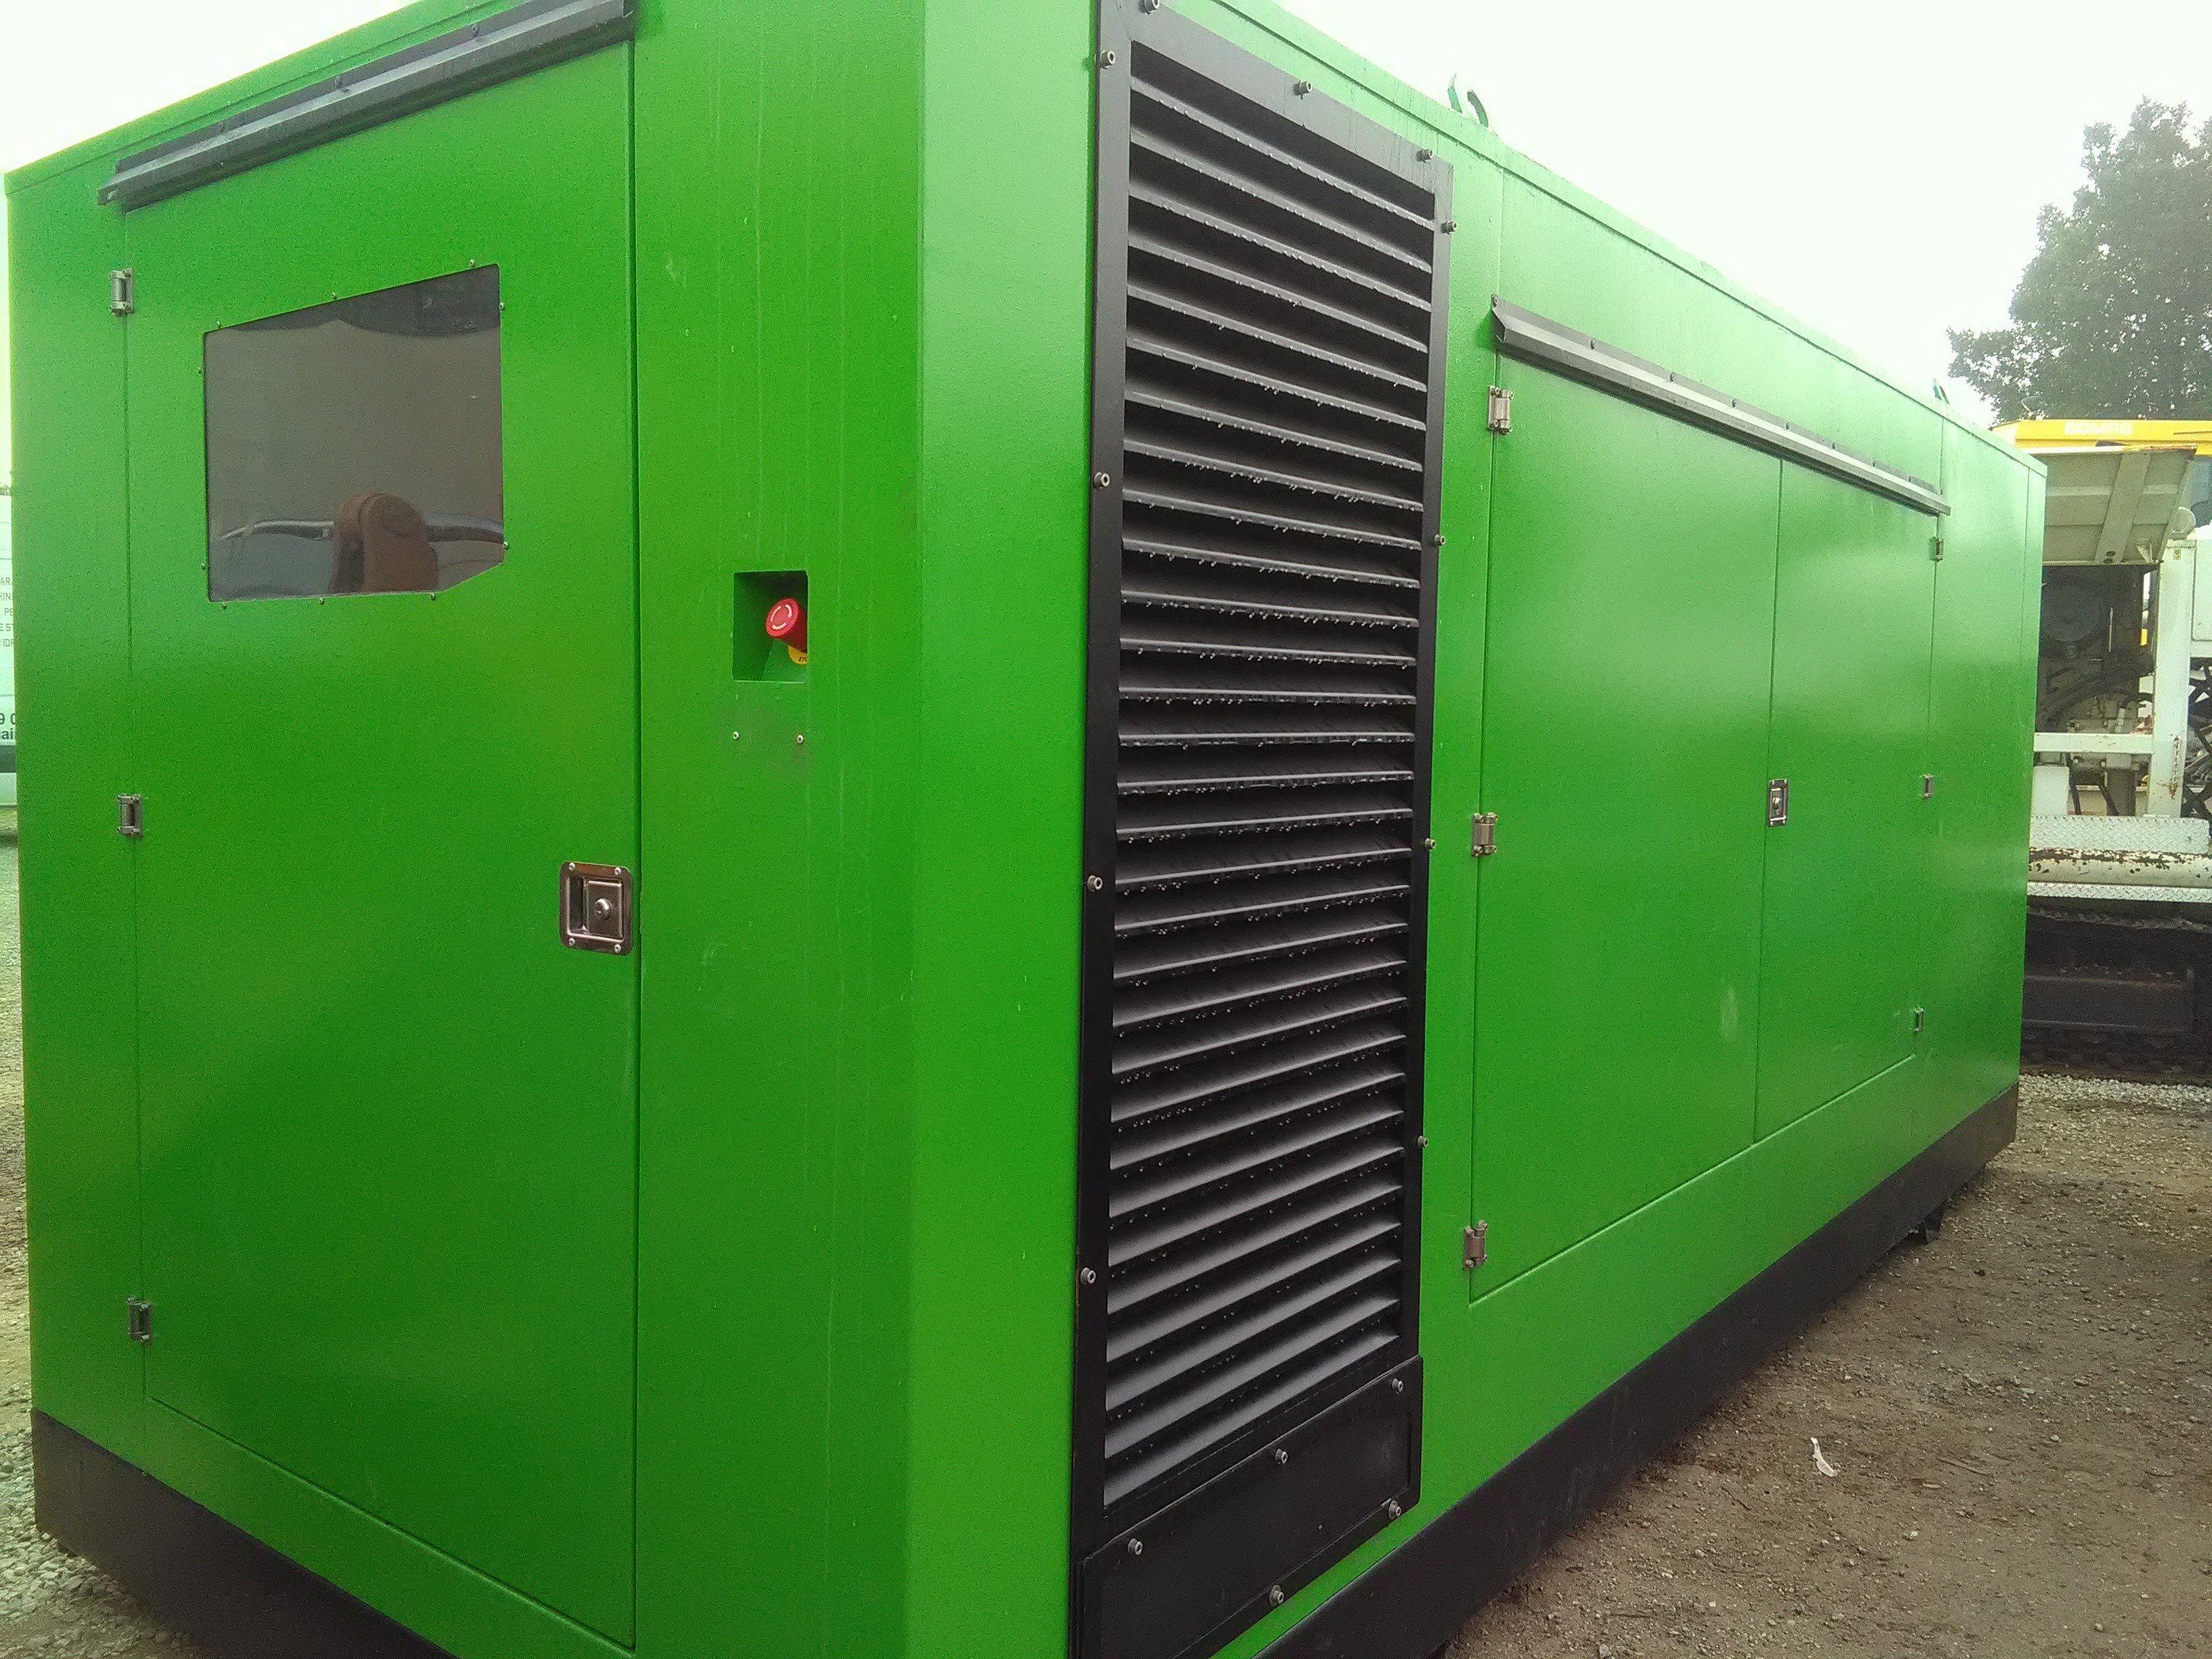 Gruppo Elettrogeno nuovo KW256 Green Power Systems